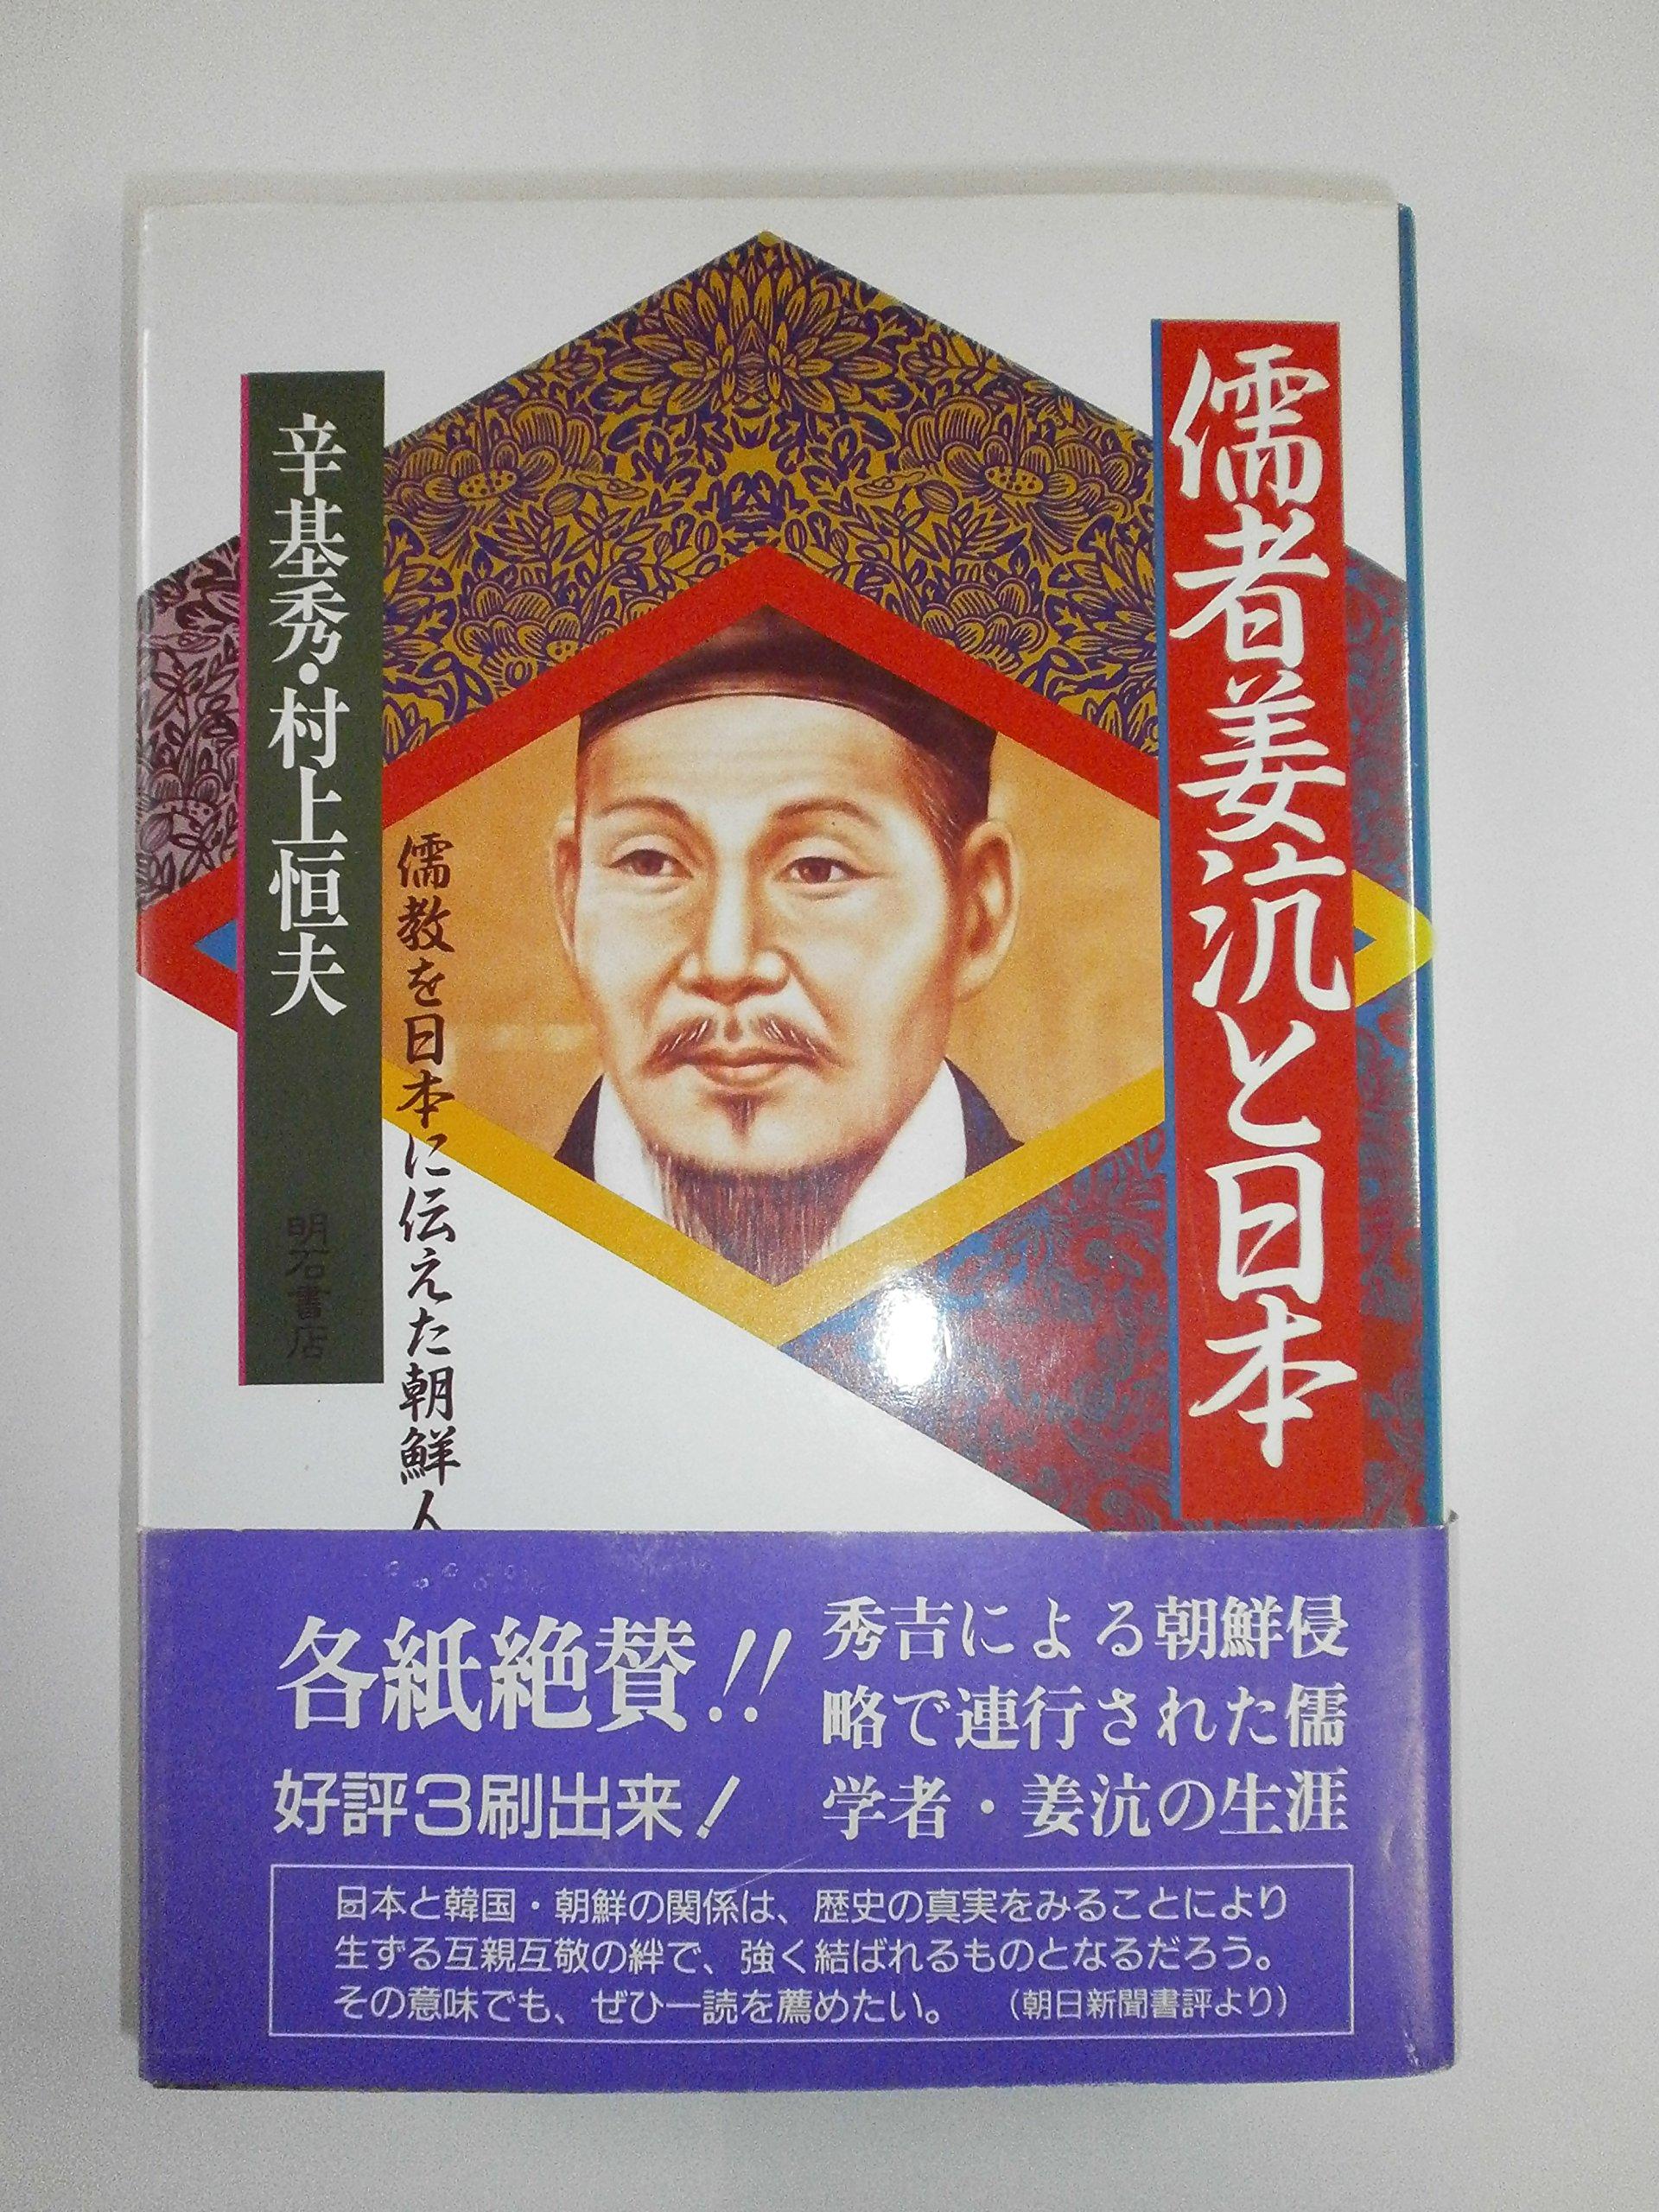 Amazon.co.jp: 儒者姜沆と日本―儒教を日本に伝えた朝鮮人: 辛基秀 ...